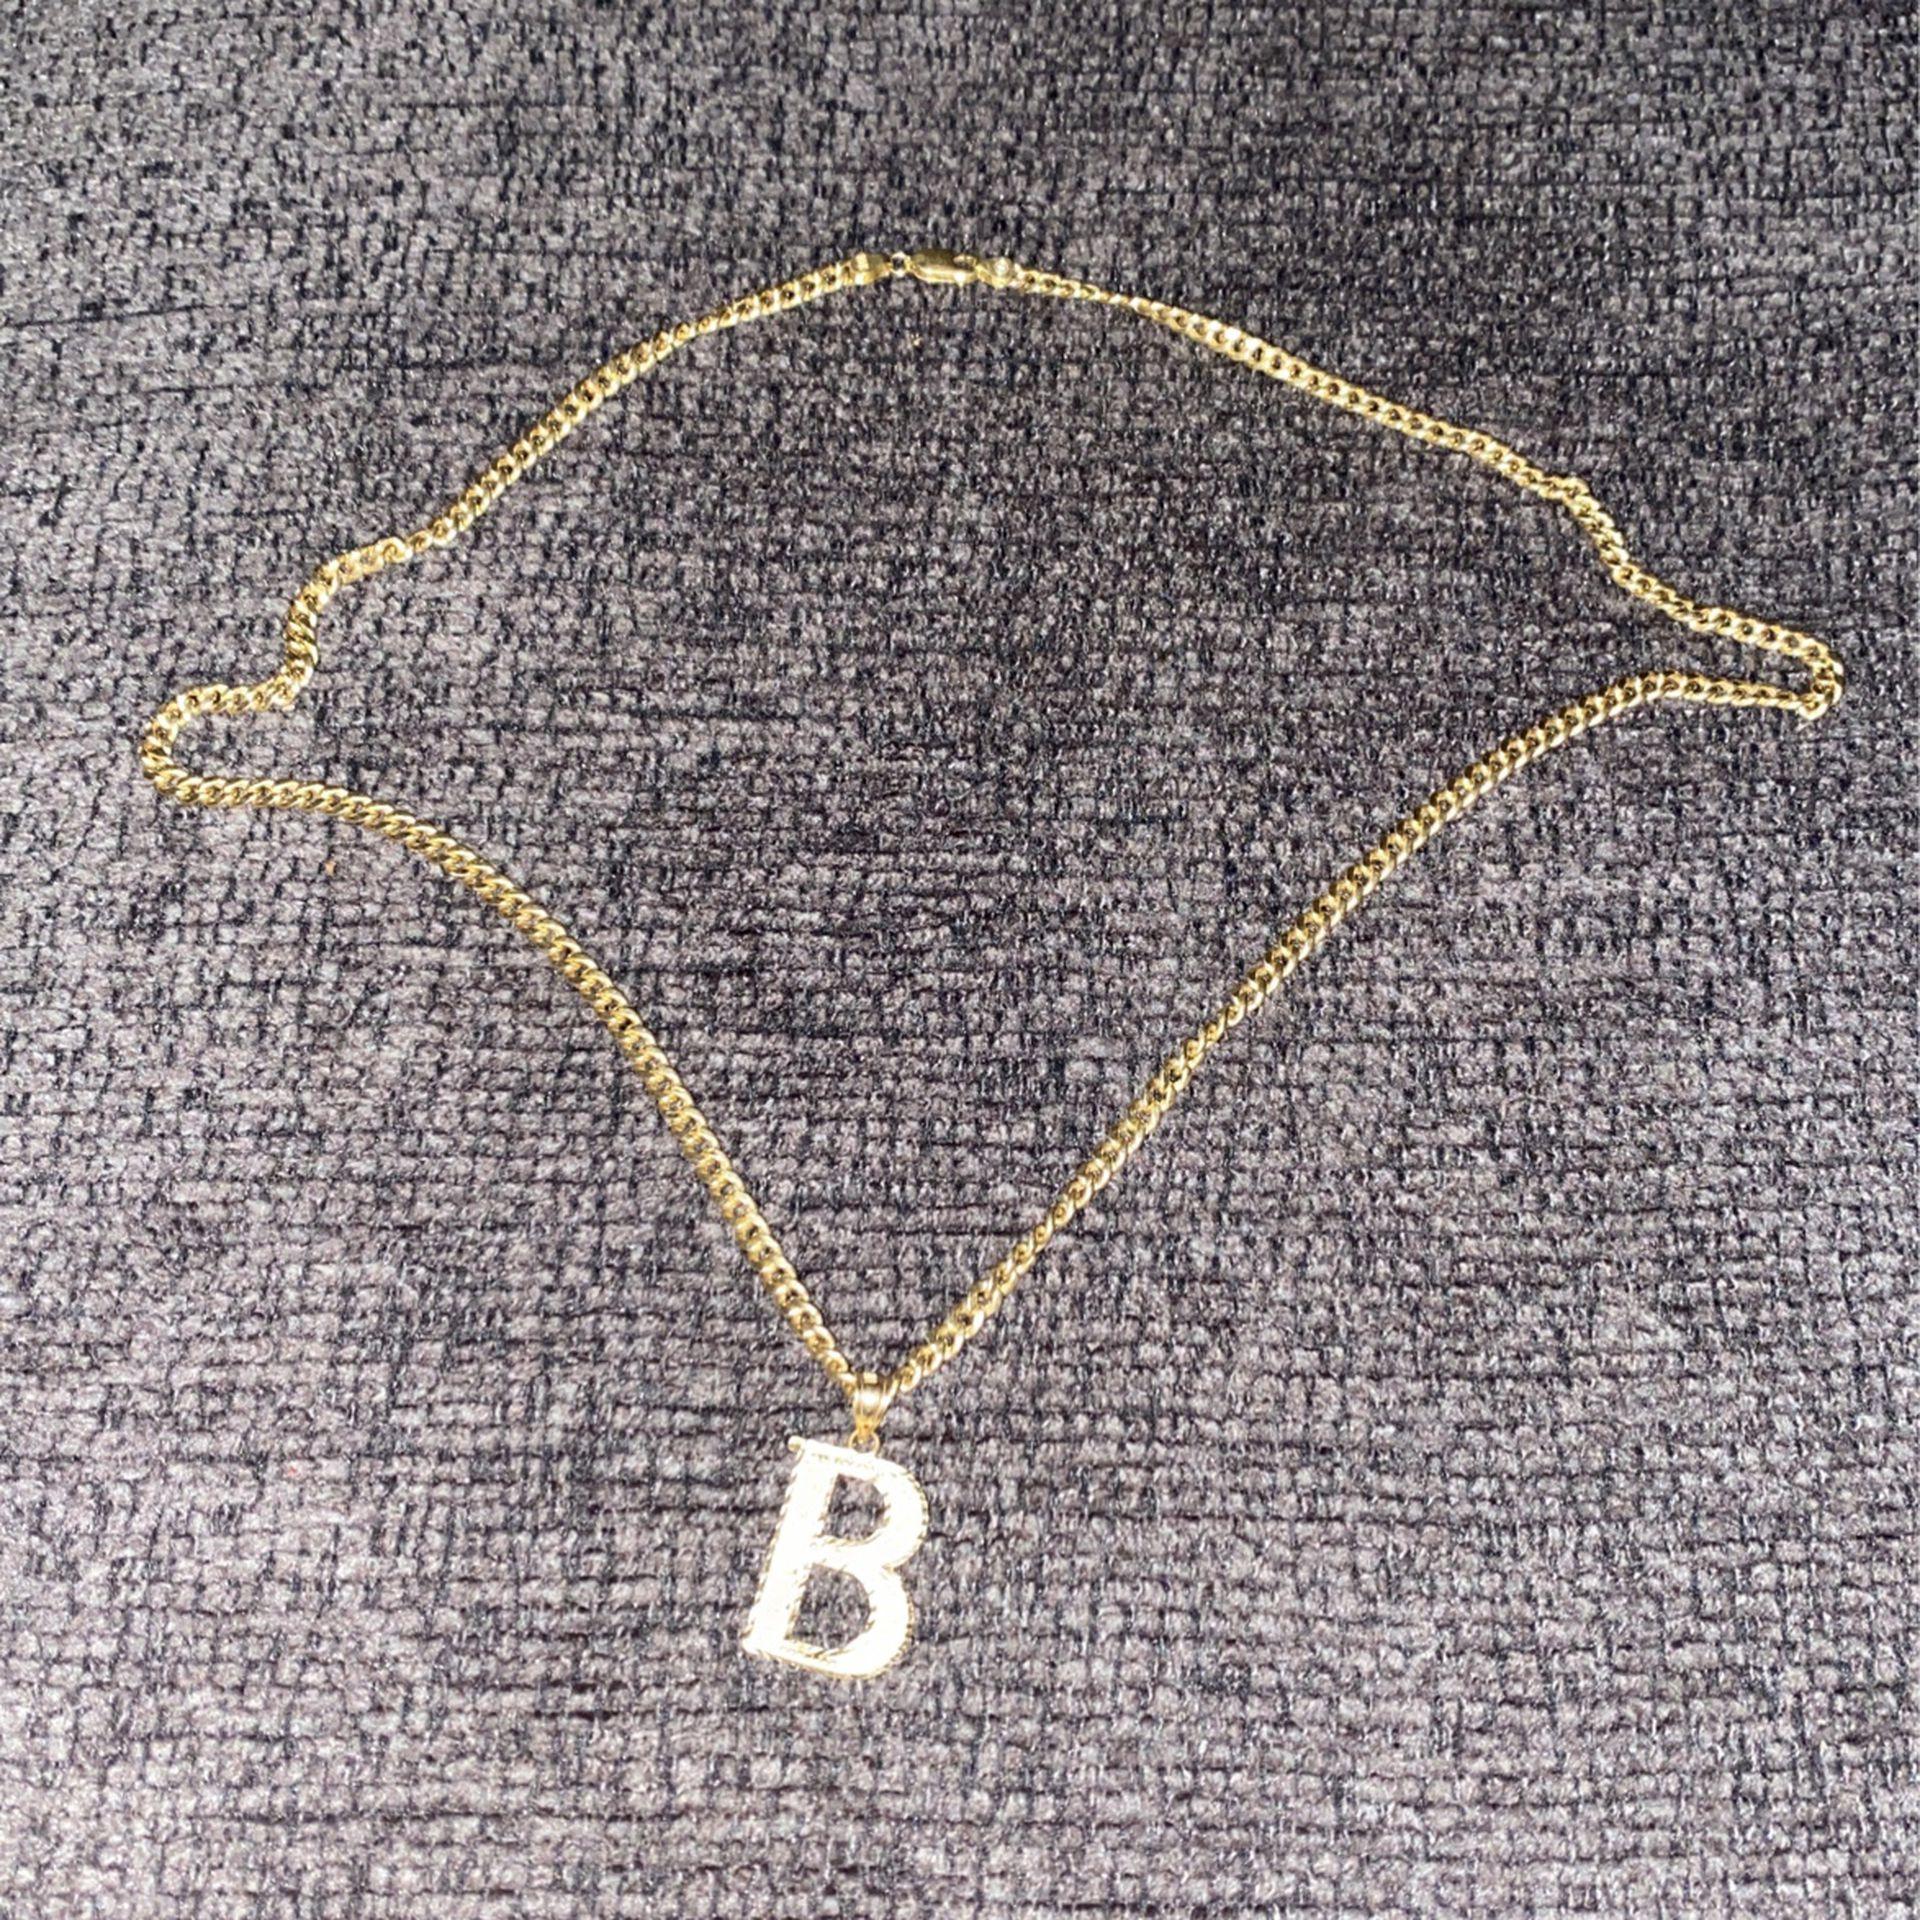 10k Cuban link    B Pendant